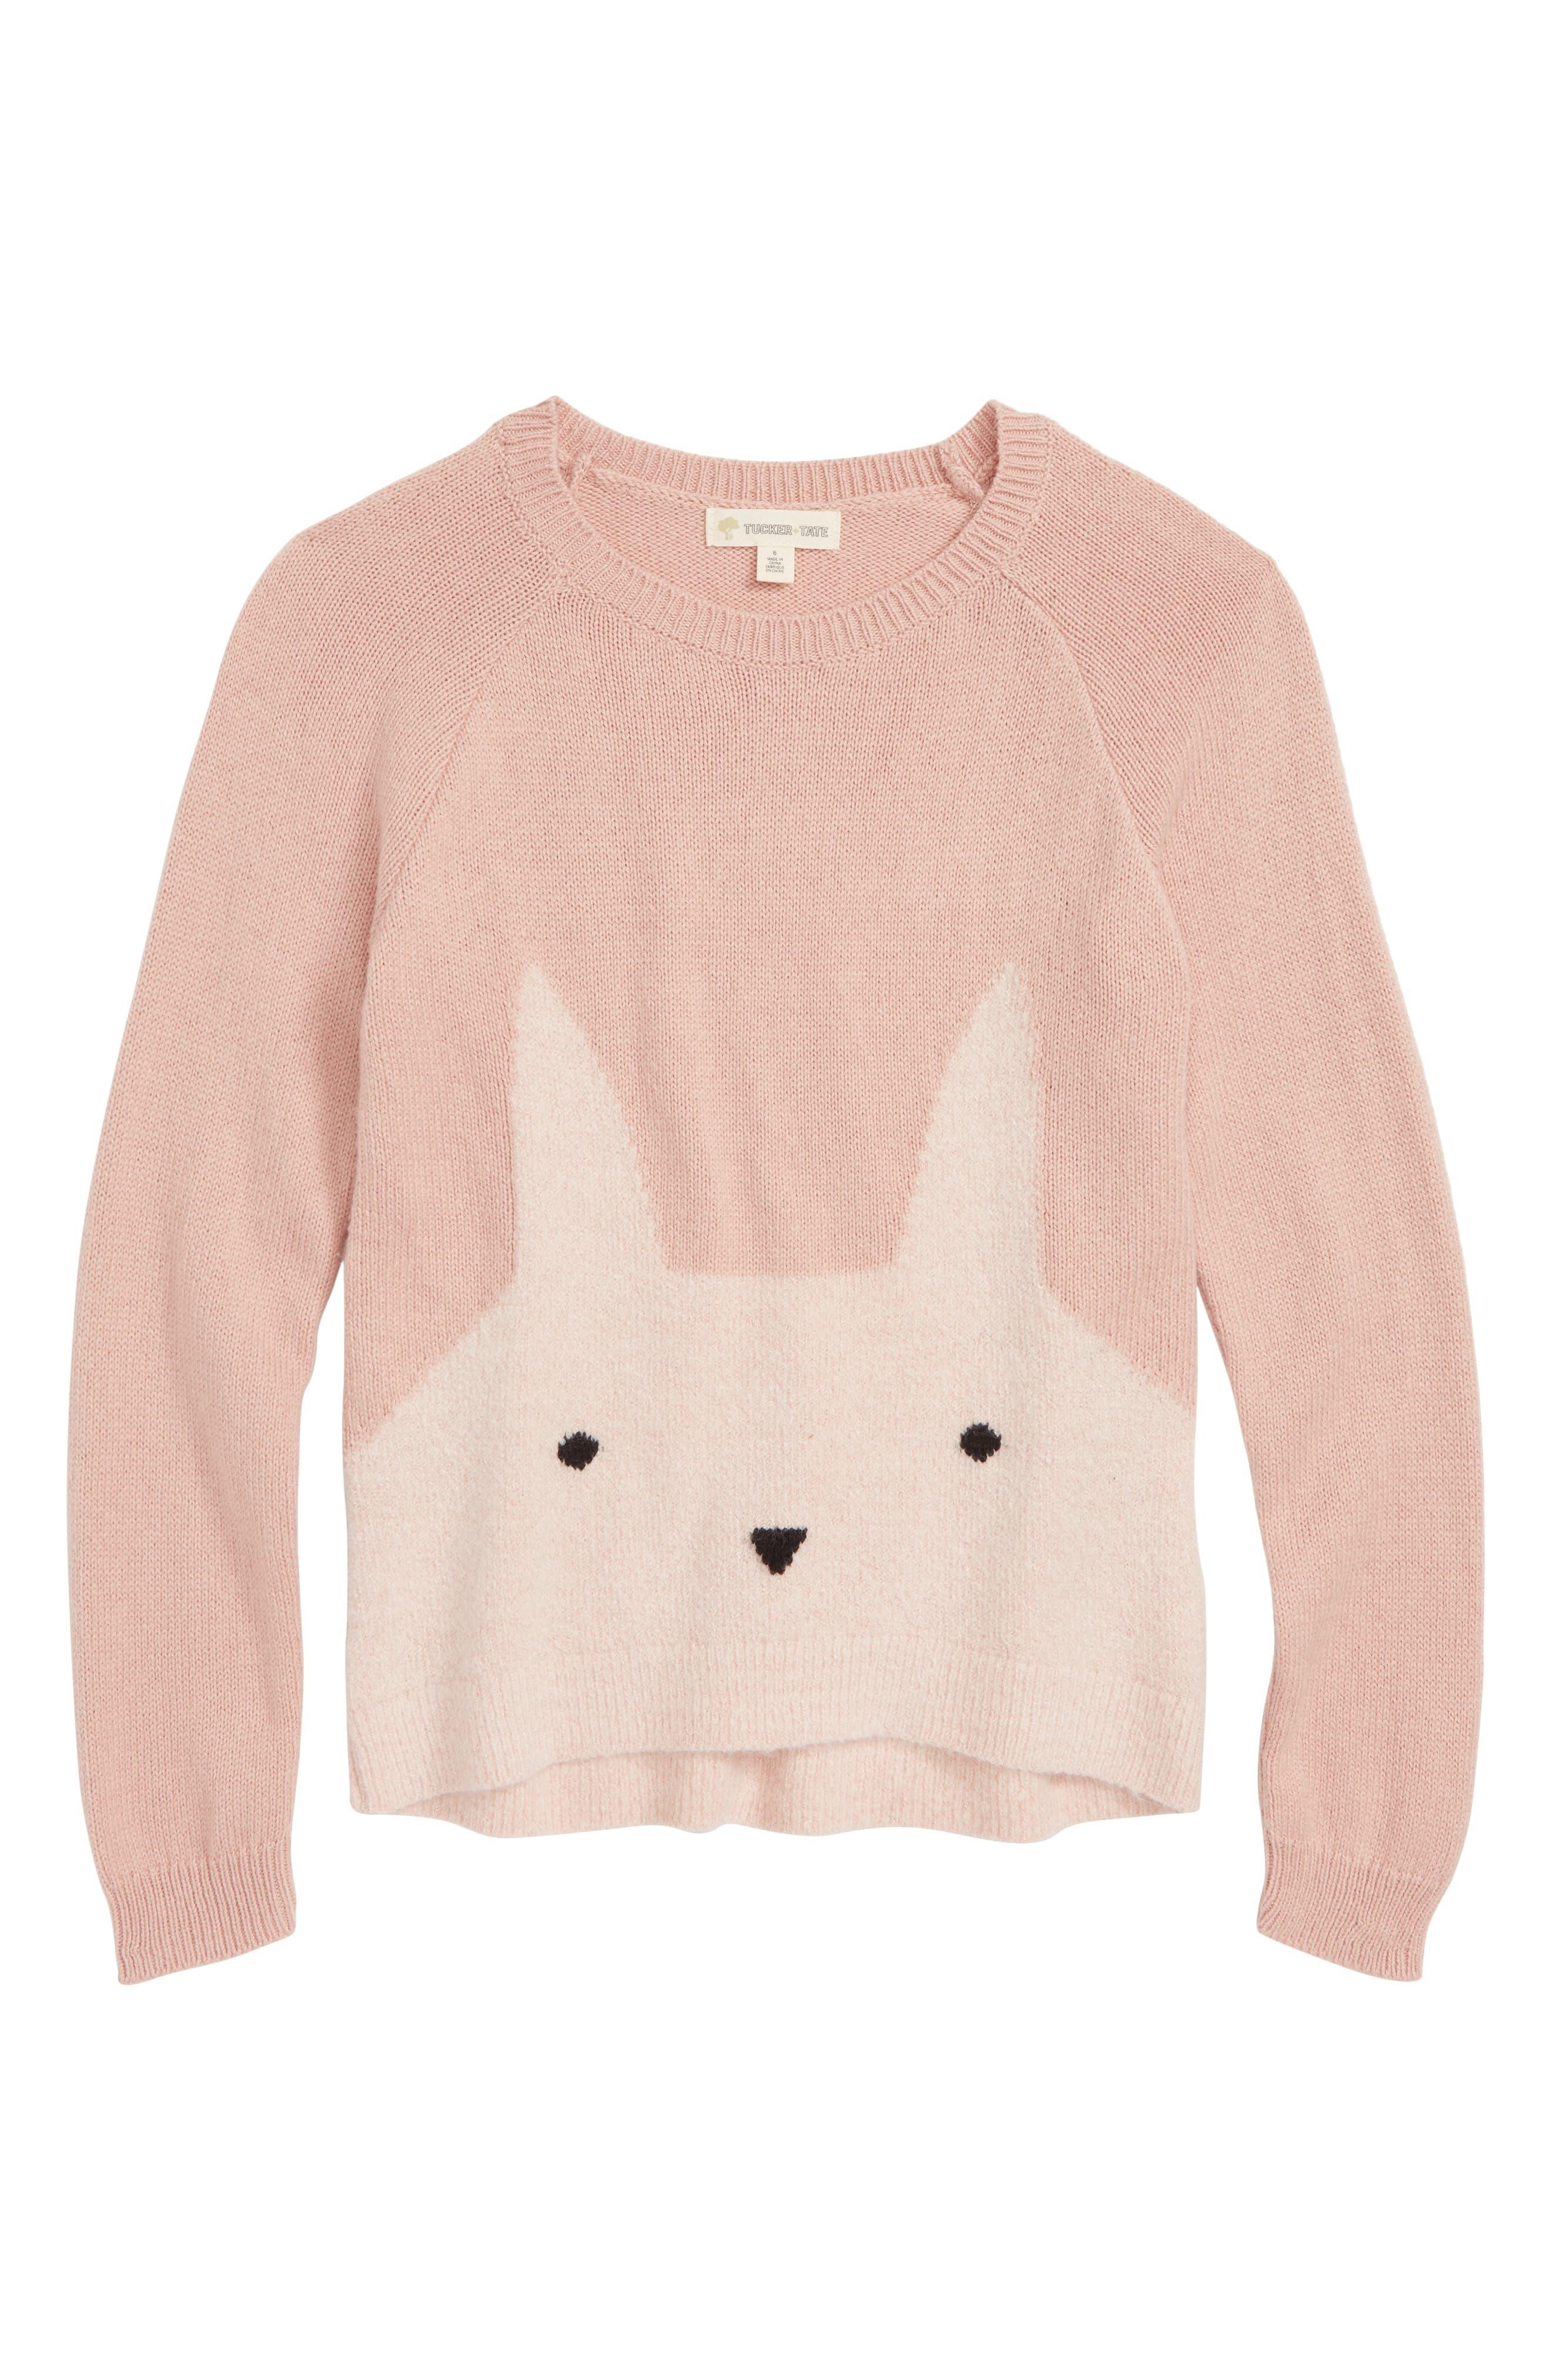 Icon Sweater,                         Main,                         color, PINK PEACHSKIN BUNNY